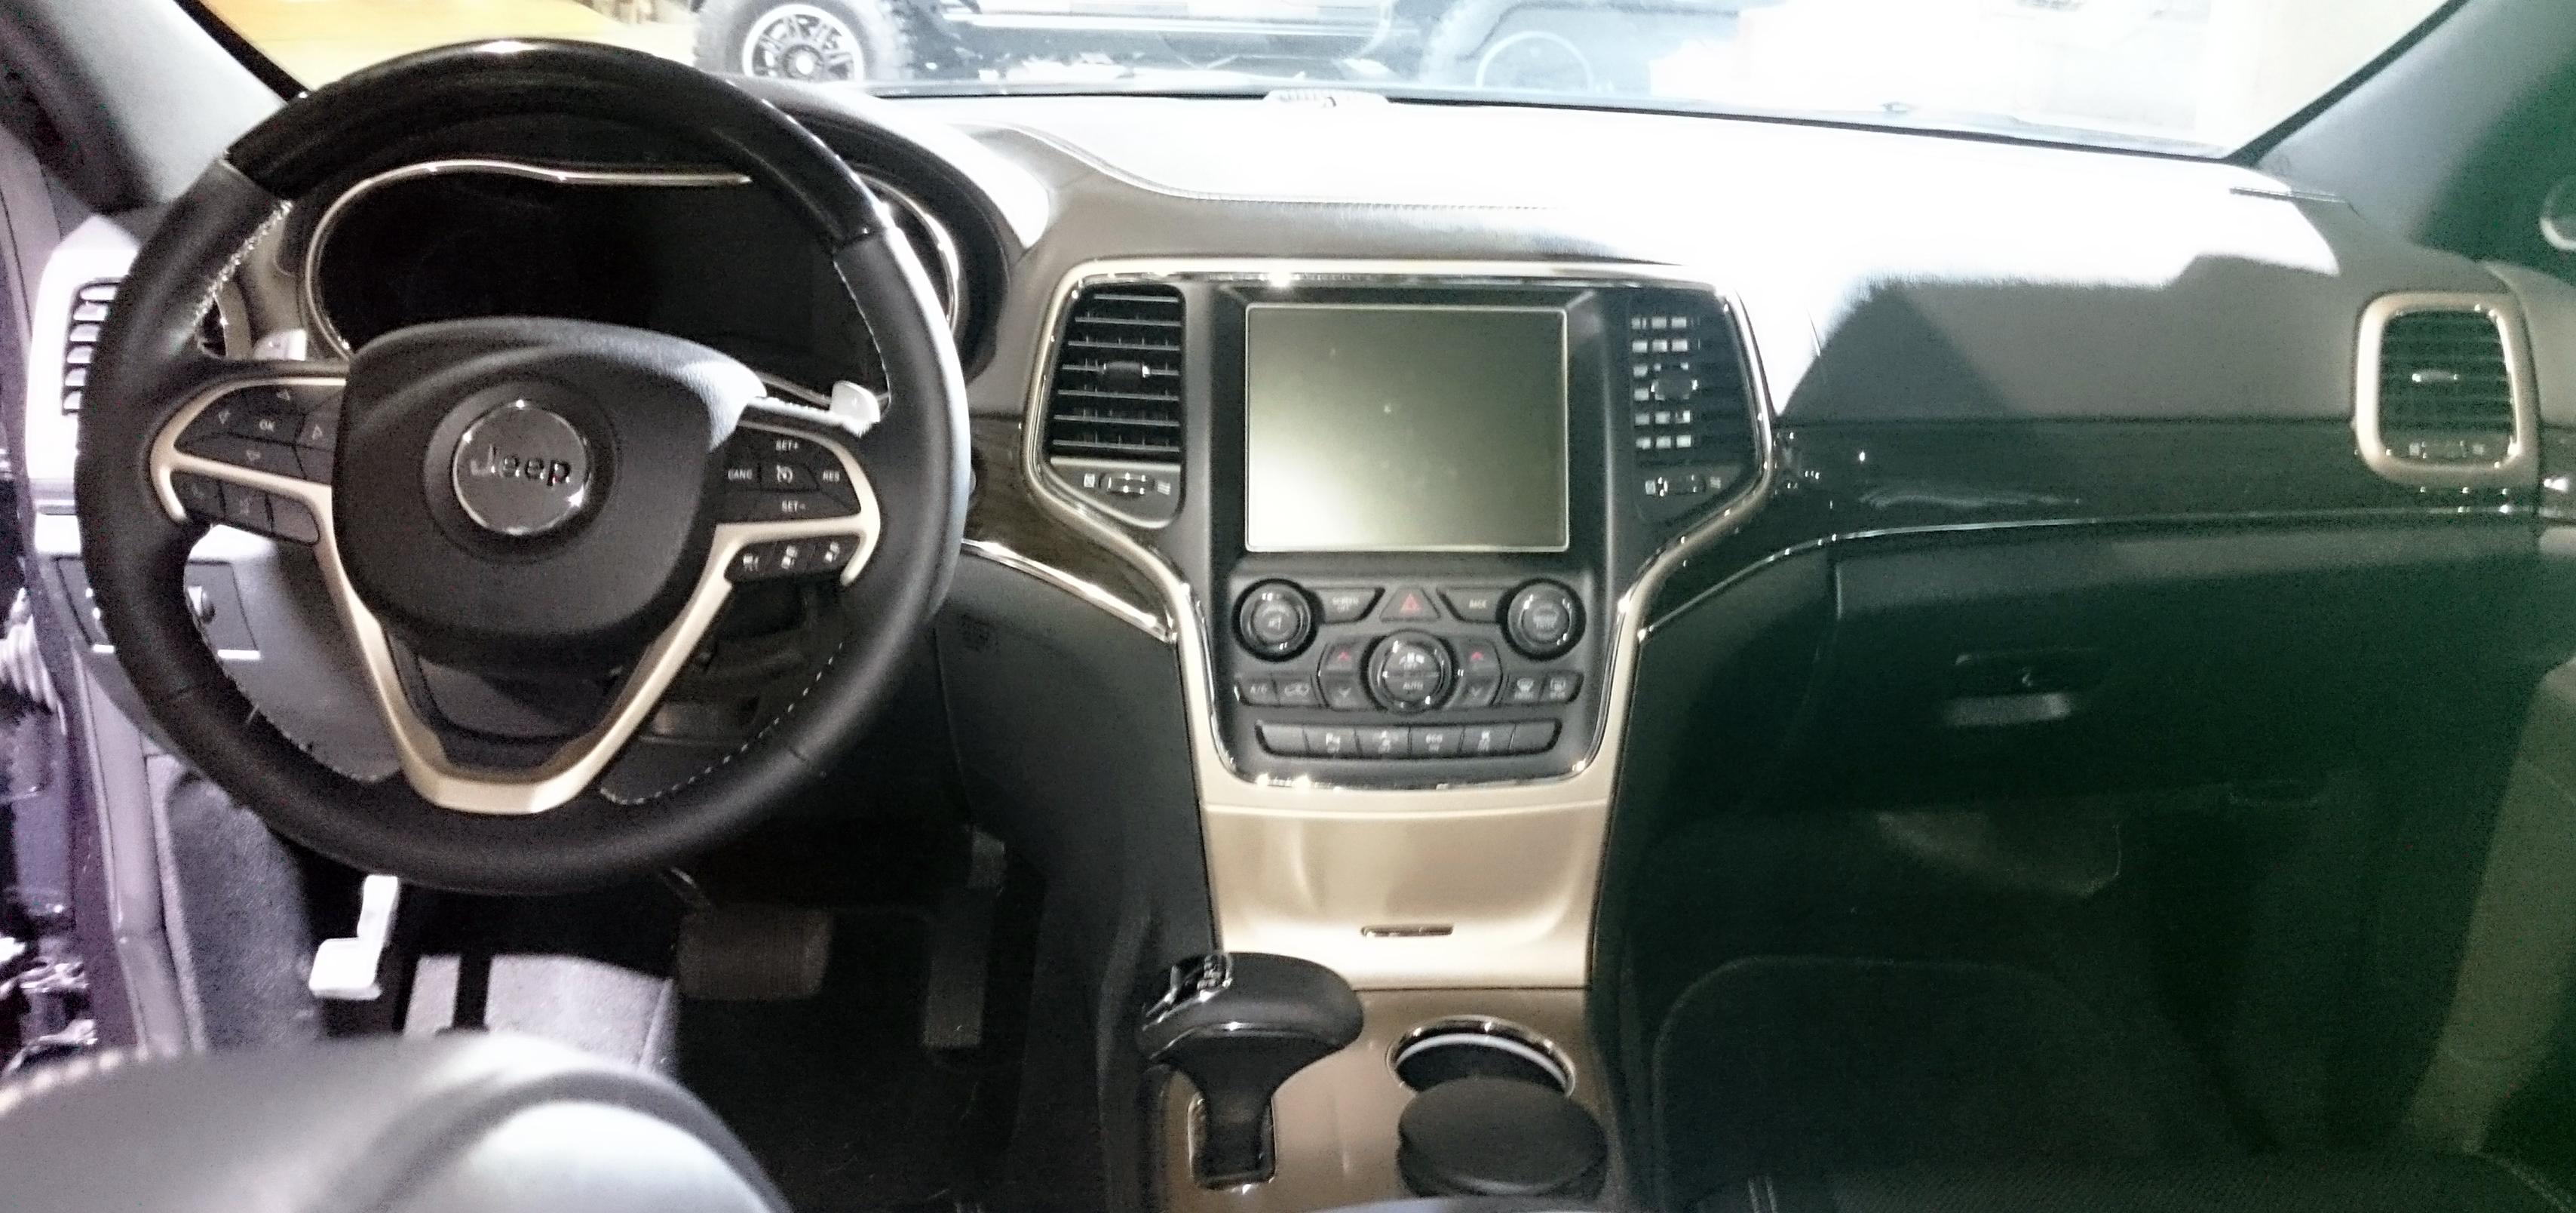 jeep grand cherokee wk ru pdf